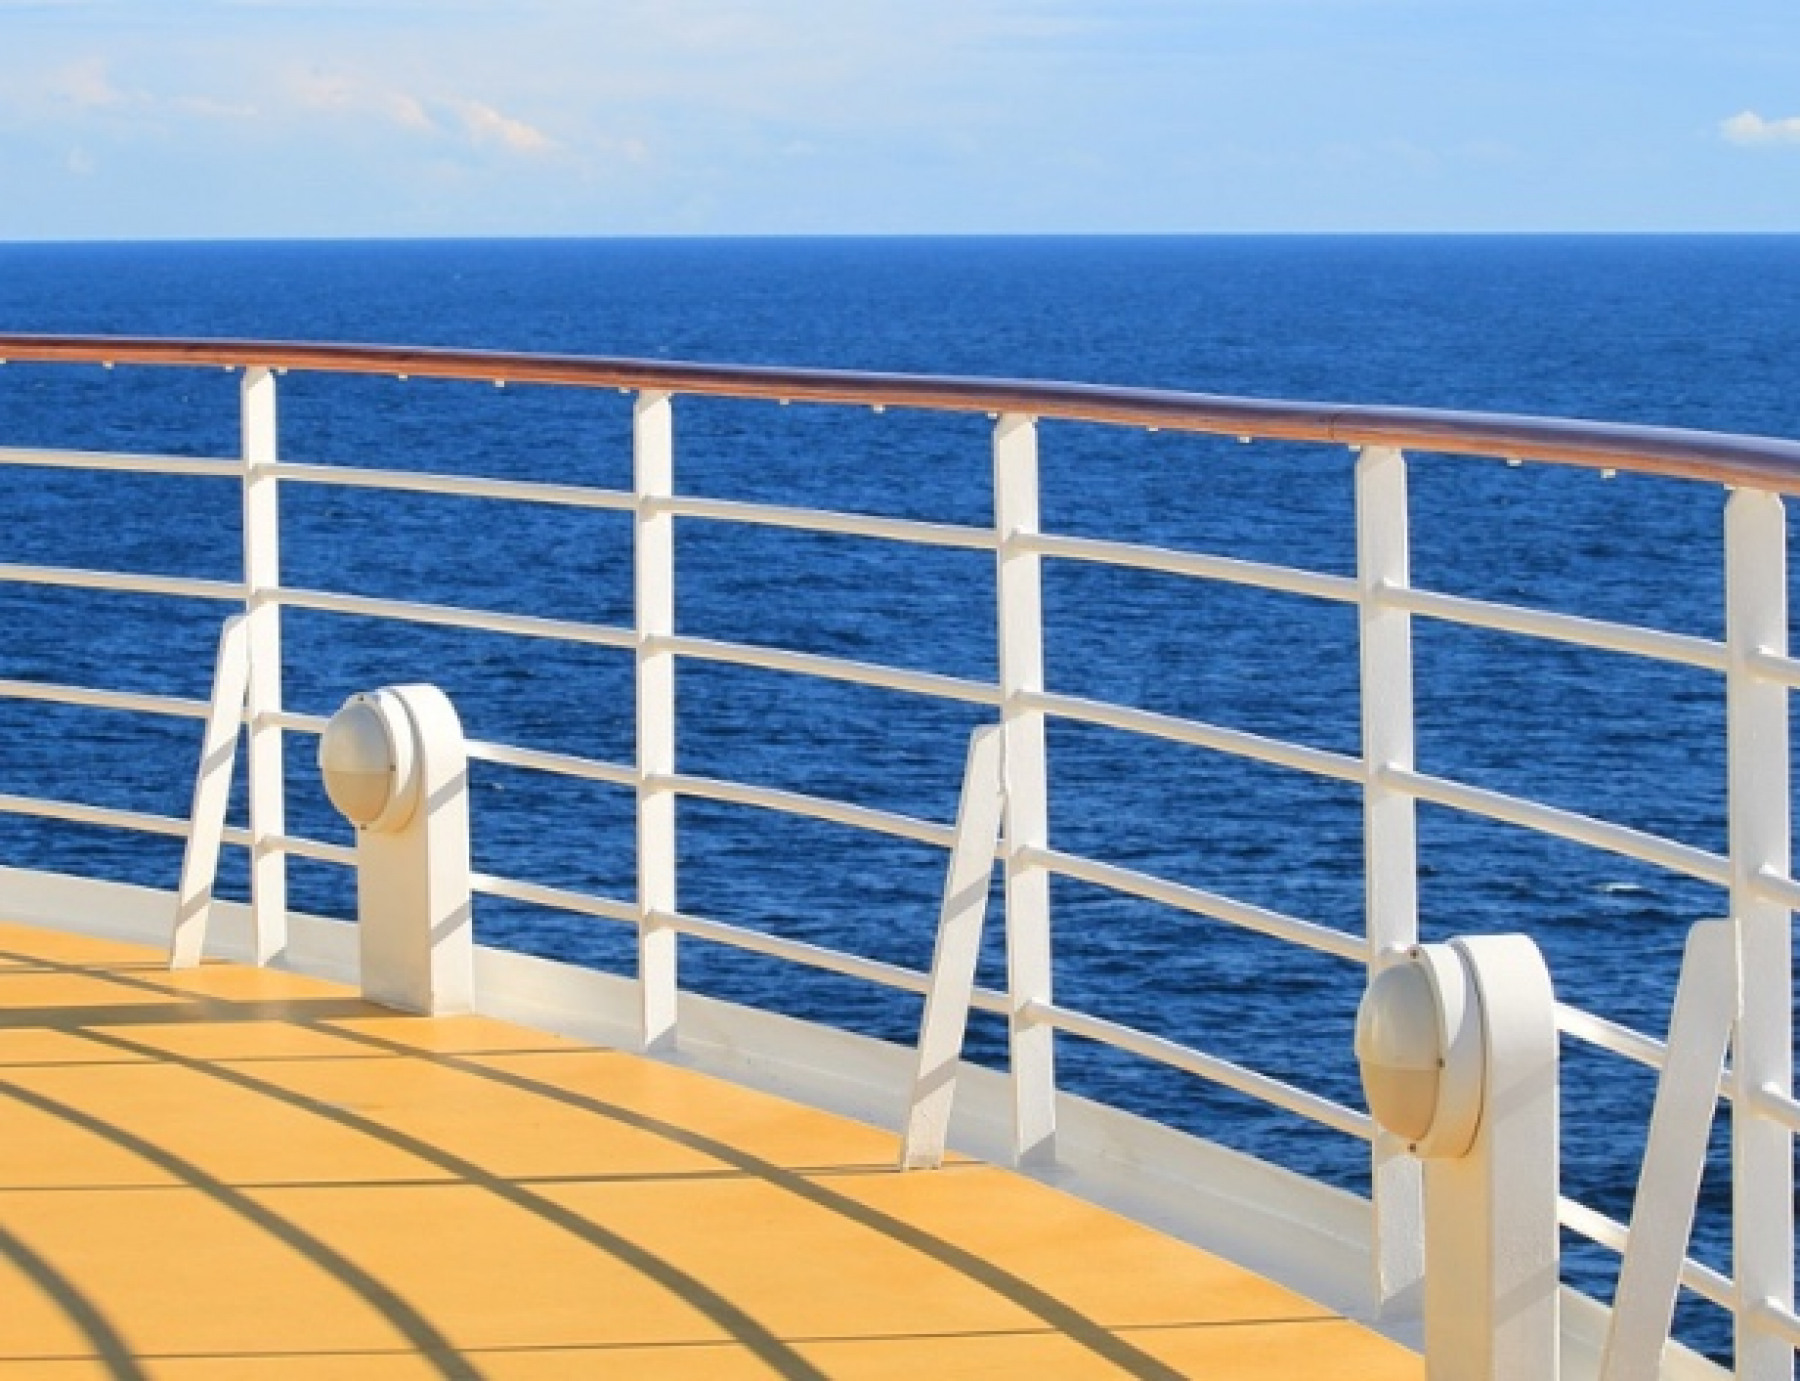 Carnival Cruise Lines Carnival Dream Interiorcamp-ocean-4.jpg